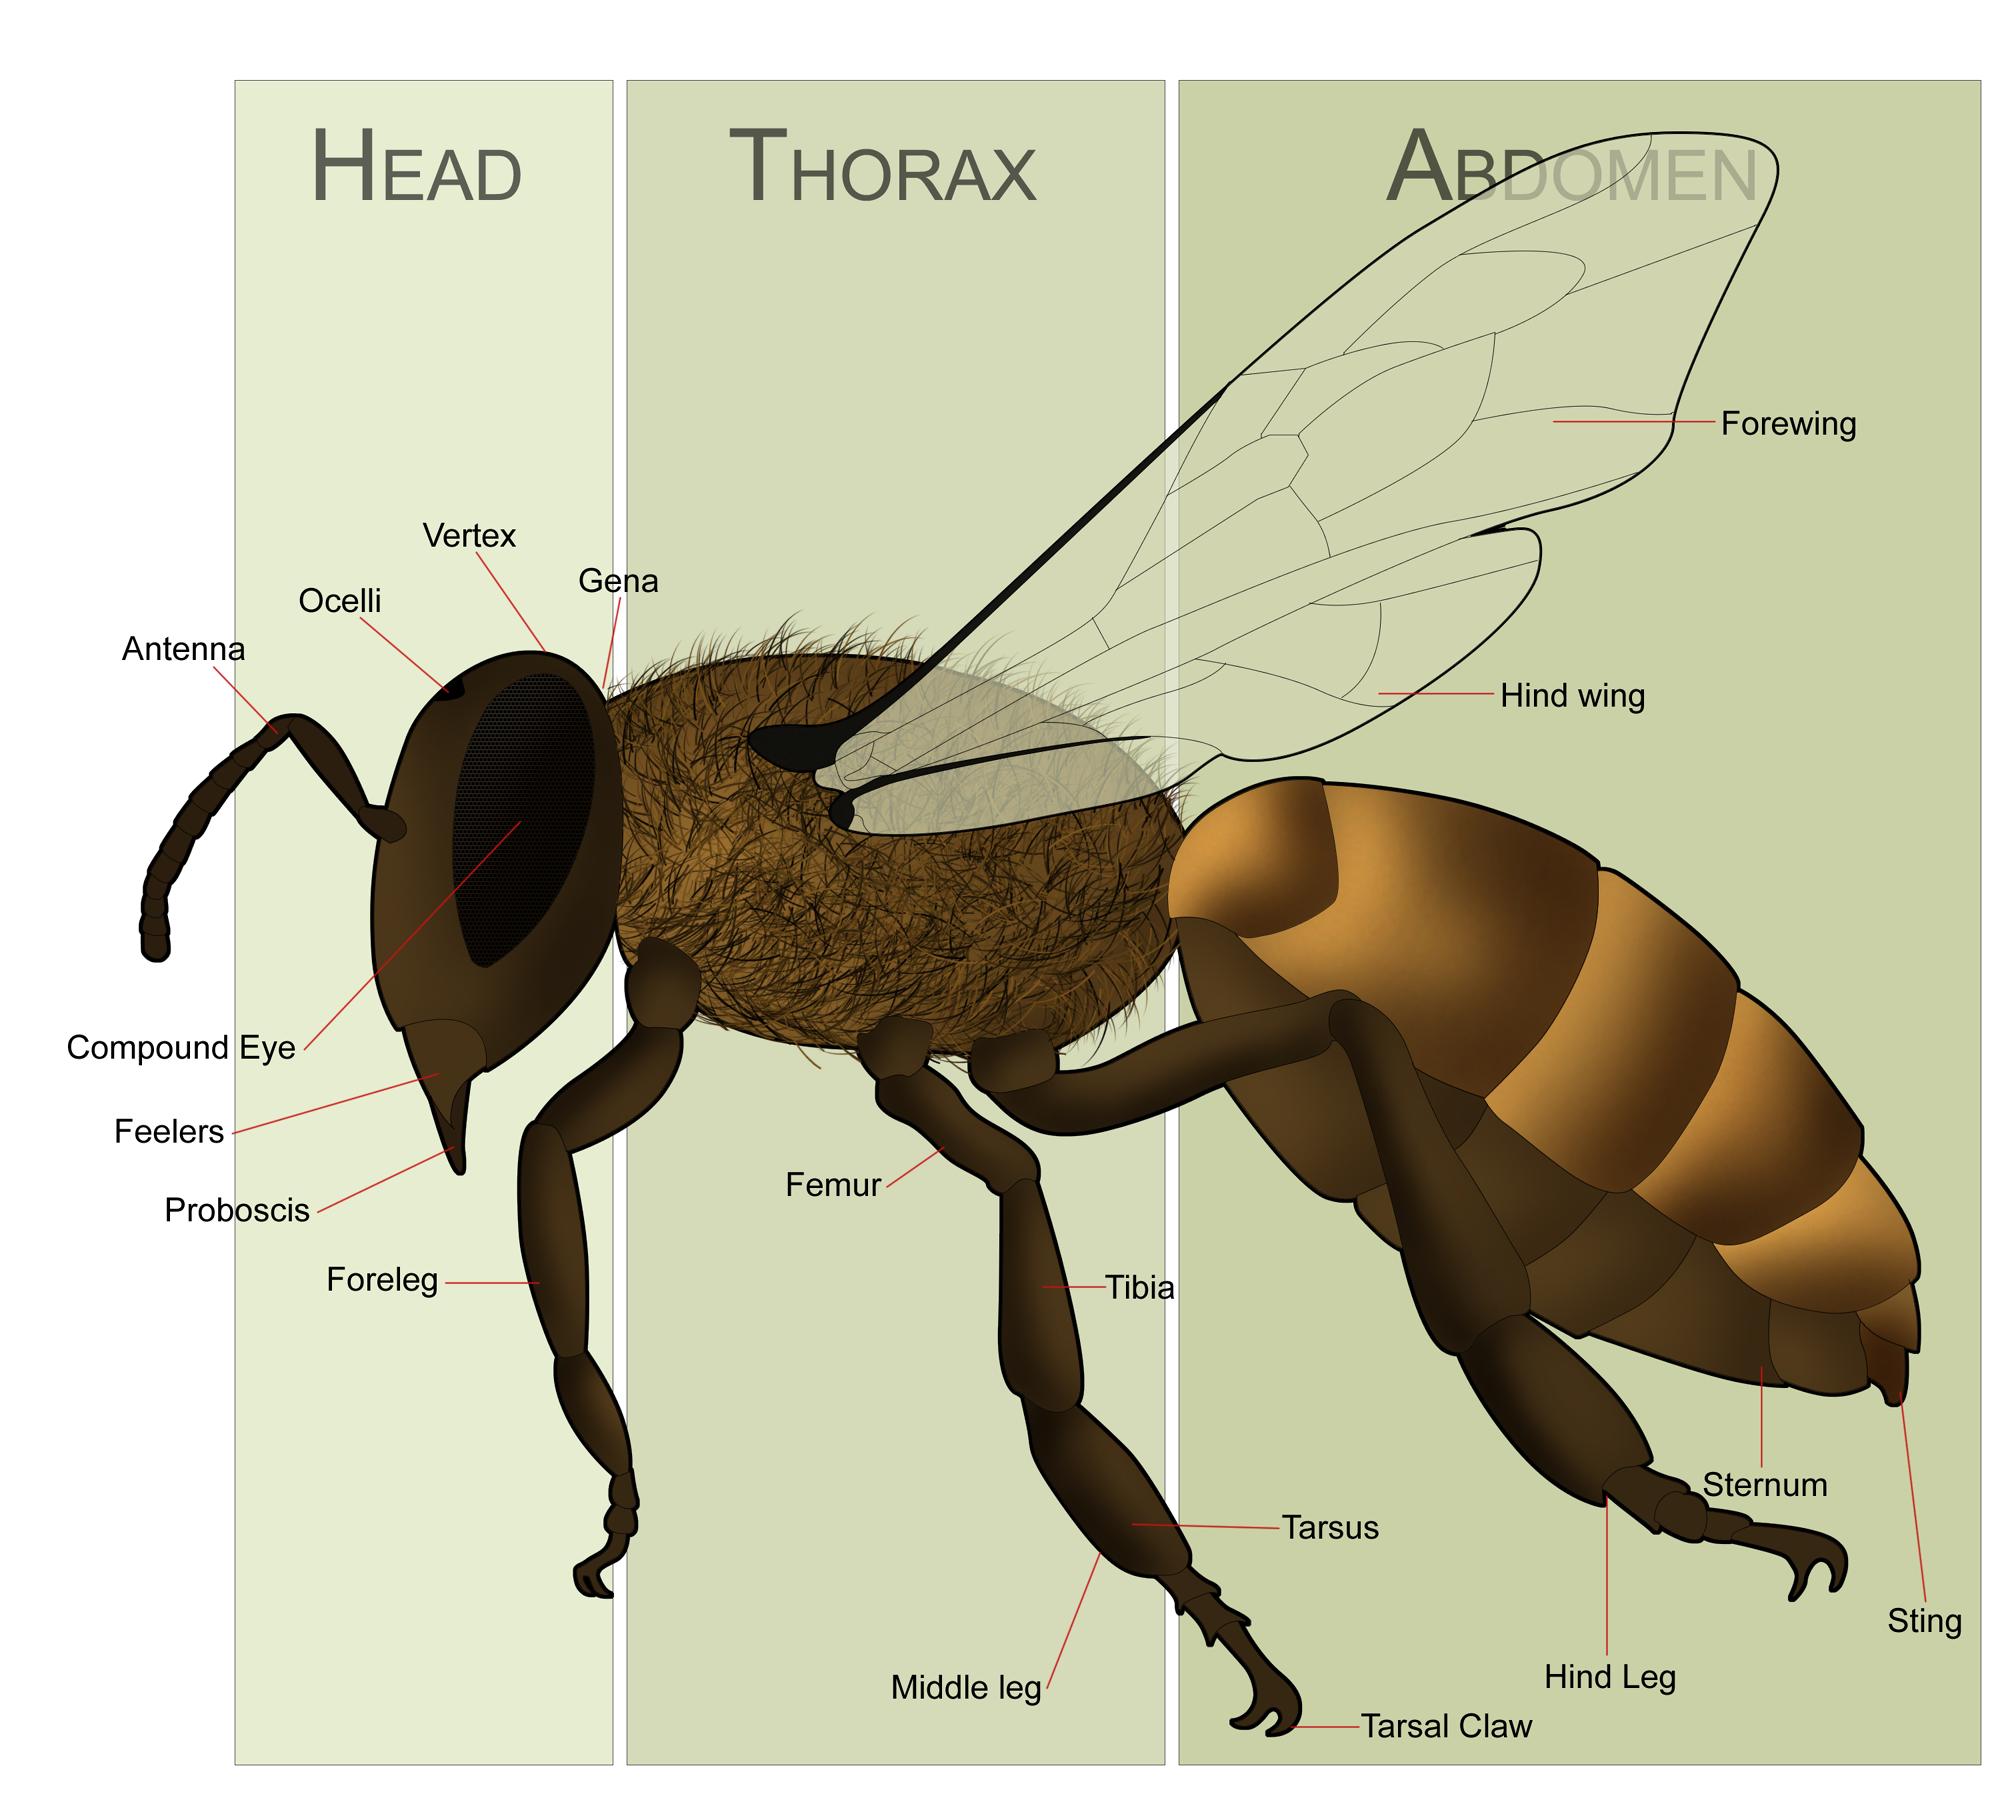 file honeybeeanatomy png wikipedia circuit board labeled diagram of a toshiba tv